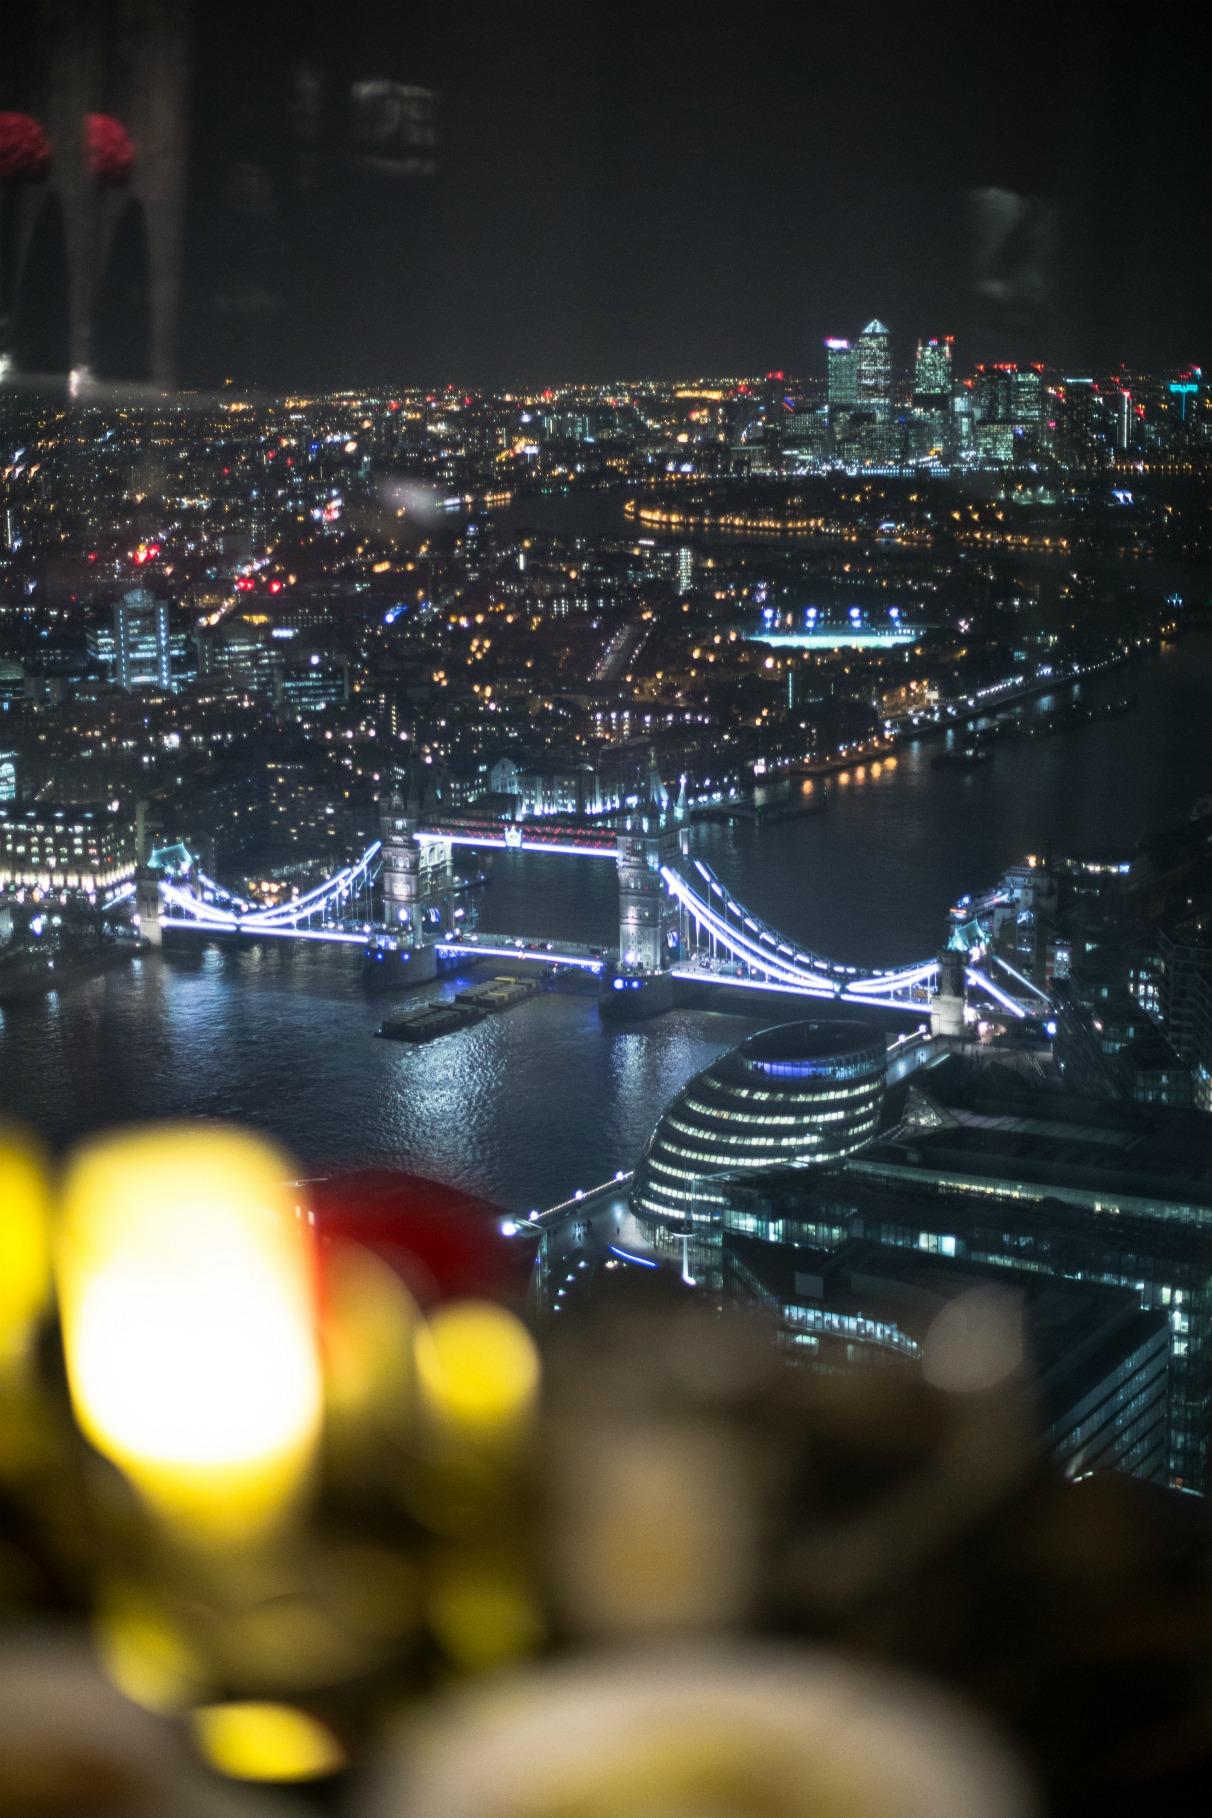 disi-couture-travel-shangri-la-hotel-shard-london-tower-bridge-england-edisa-shahini-16